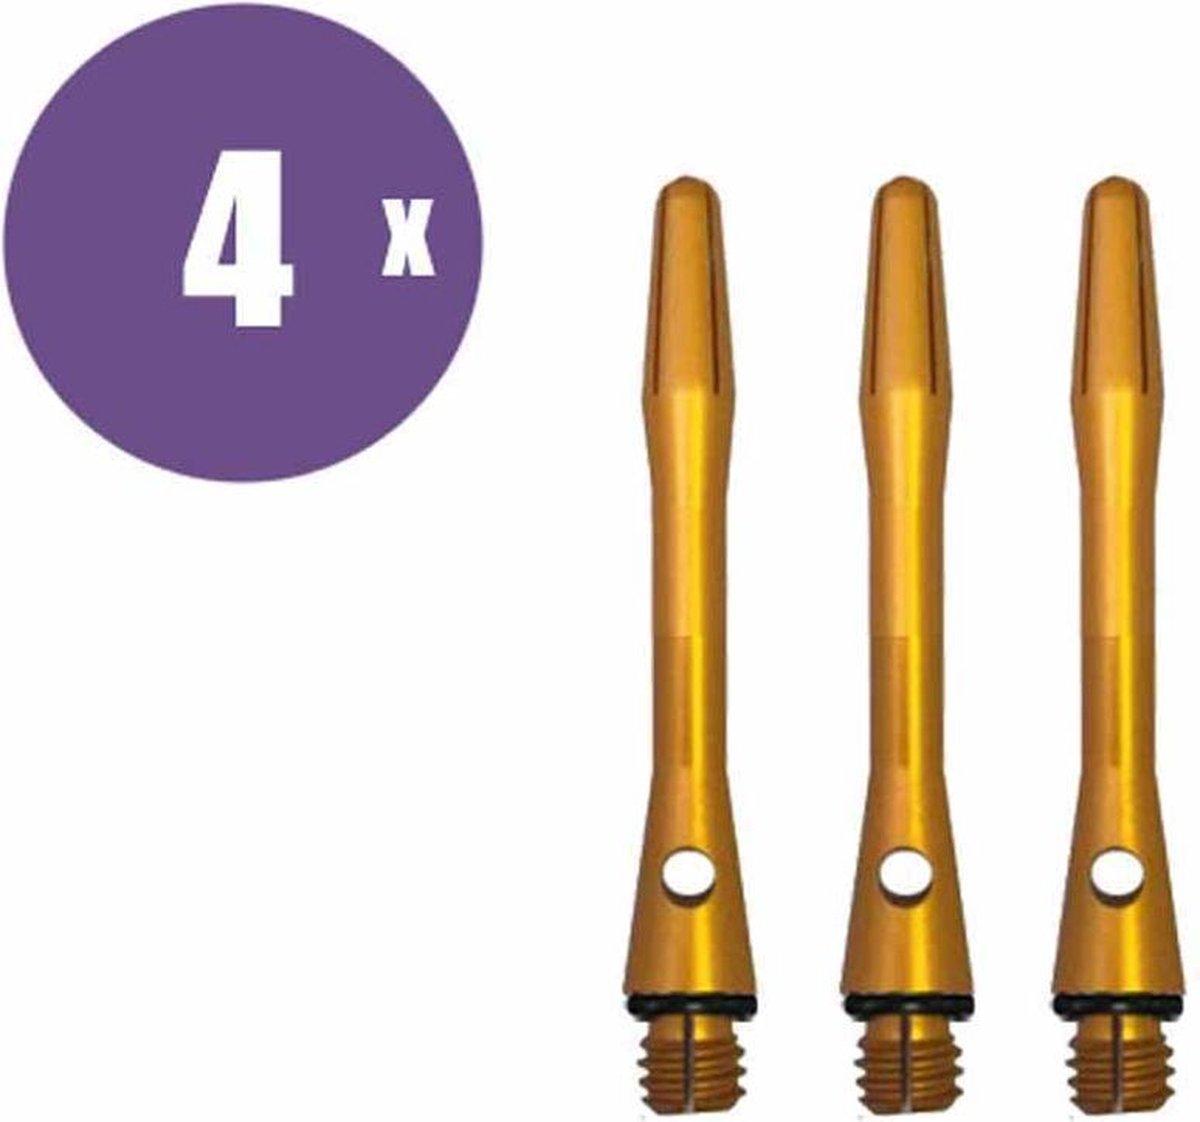 ABC Darts Shafts - Aluminium Geel - Short - 4 sets dartshafts